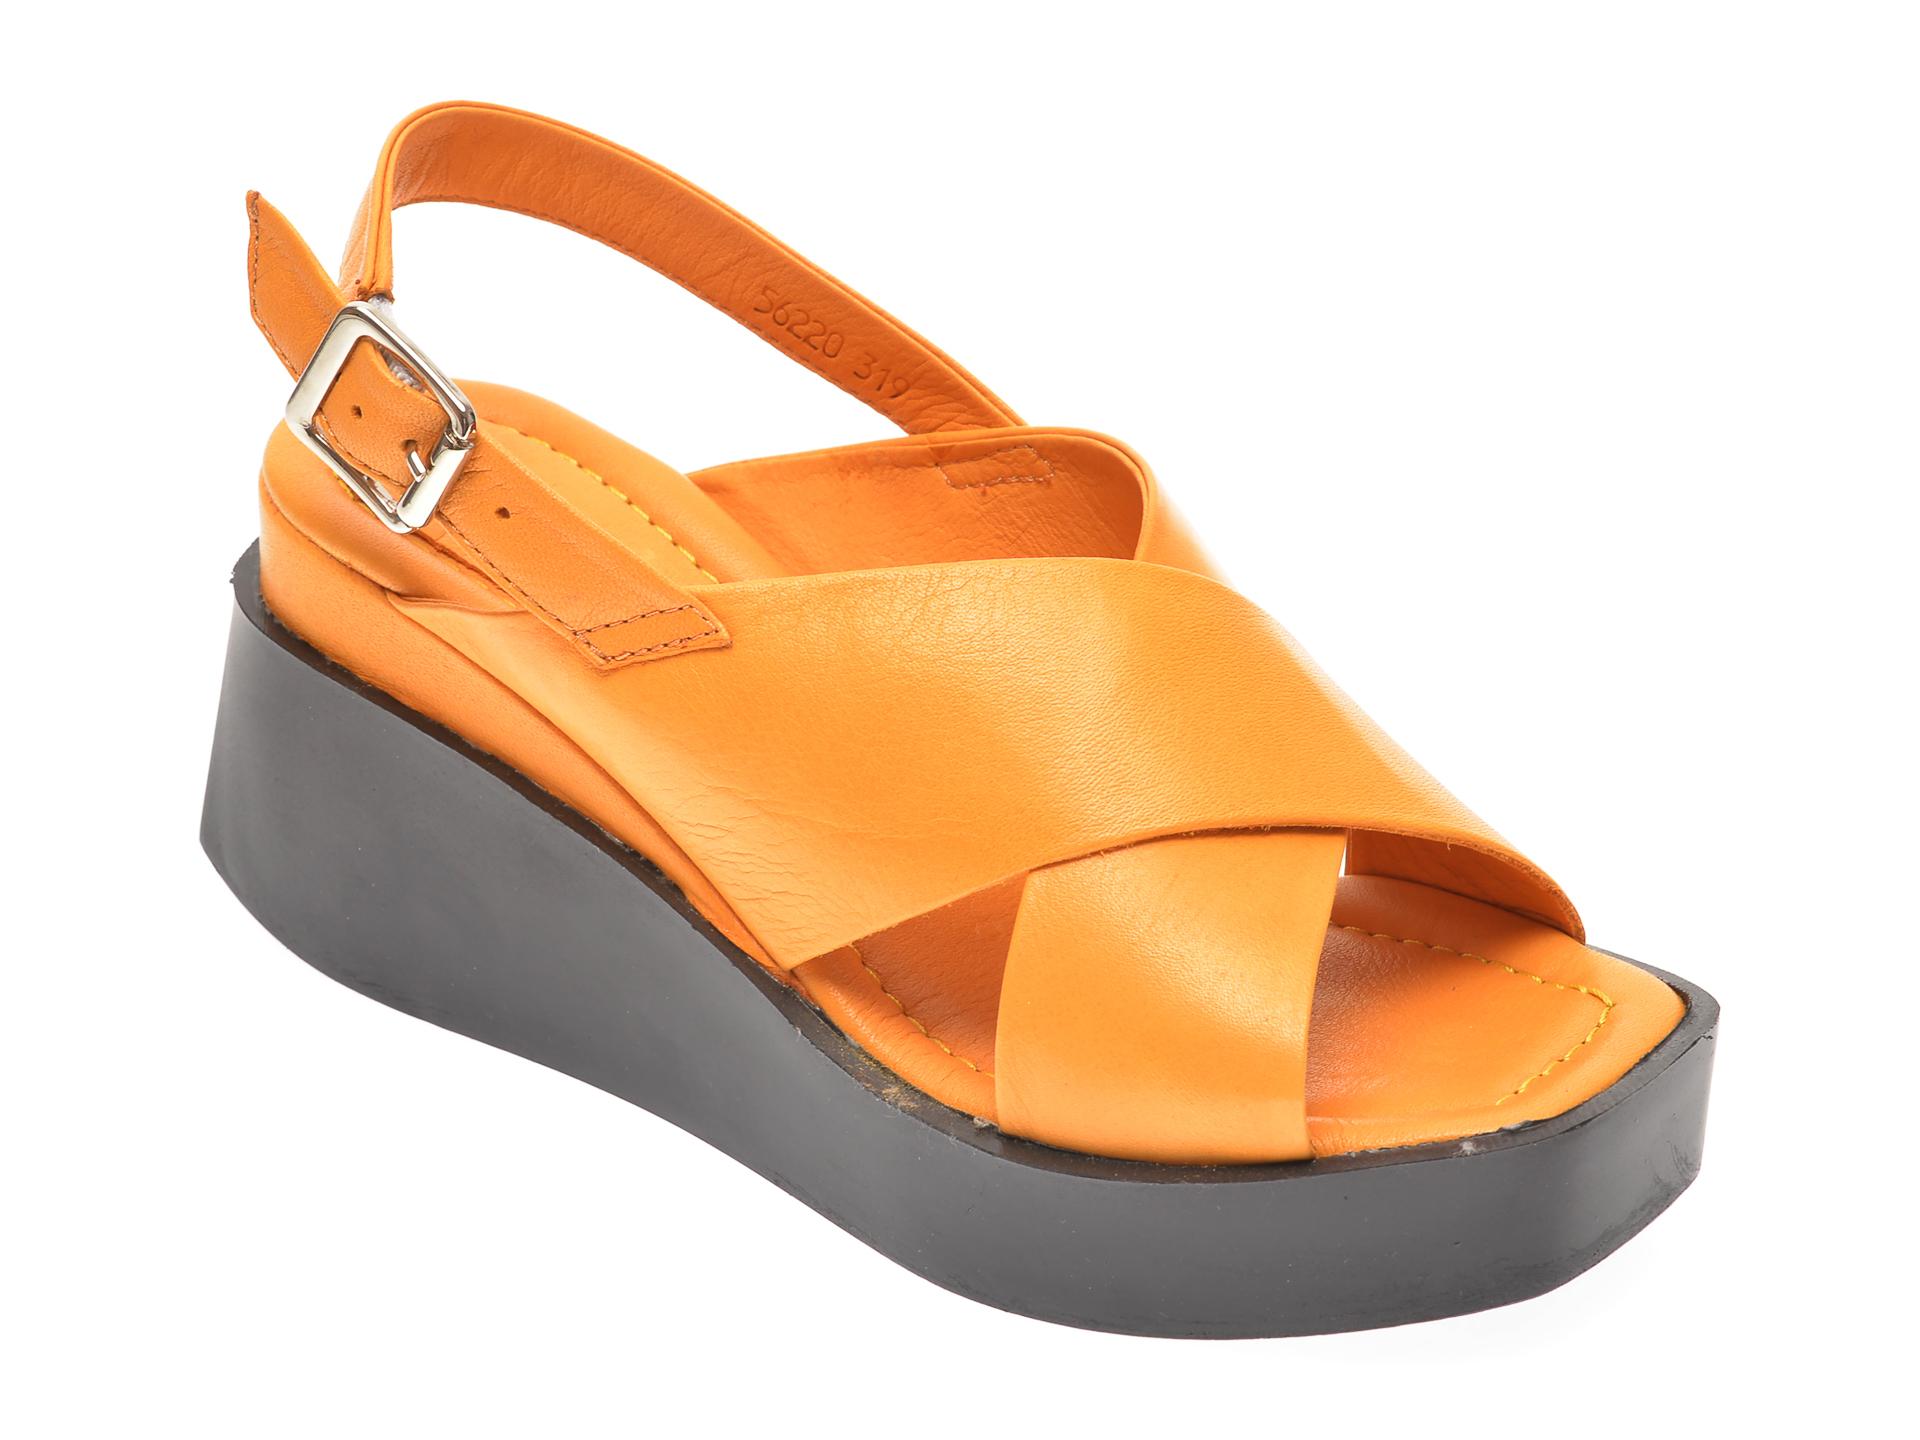 Sandale PRIMOVALERIO galbene, 56220, din piele naturala New